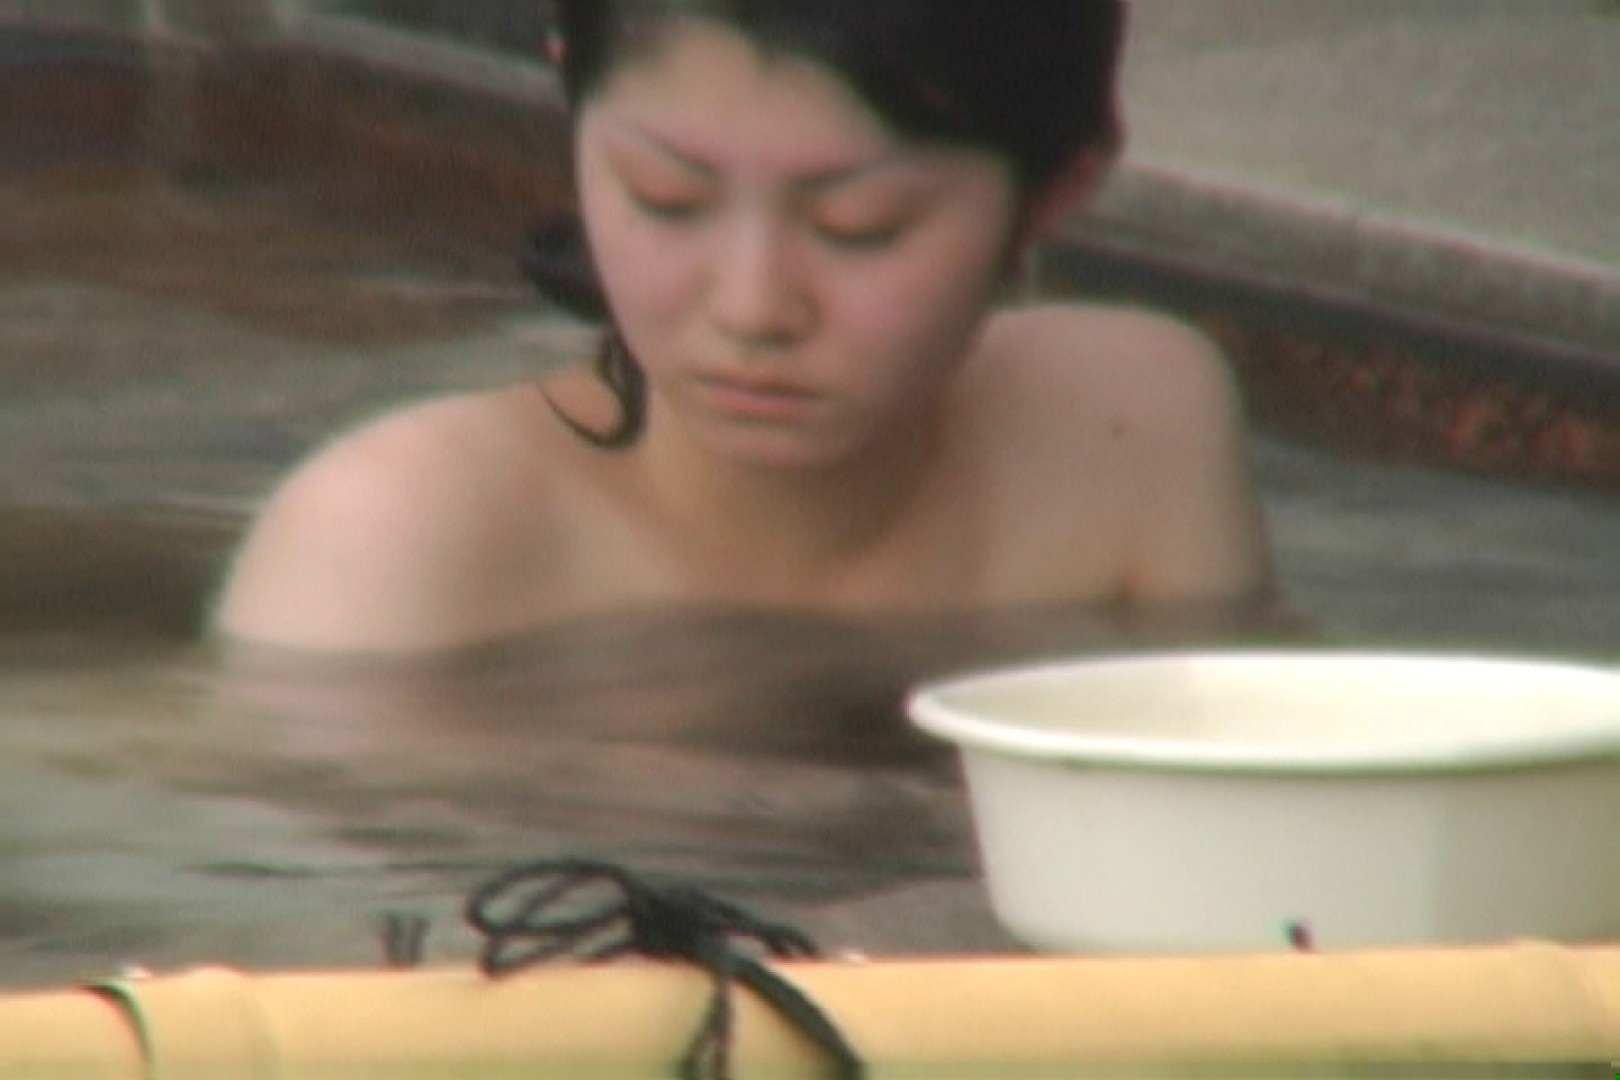 Aquaな露天風呂Vol.579 綺麗なOLたち  68枚 33